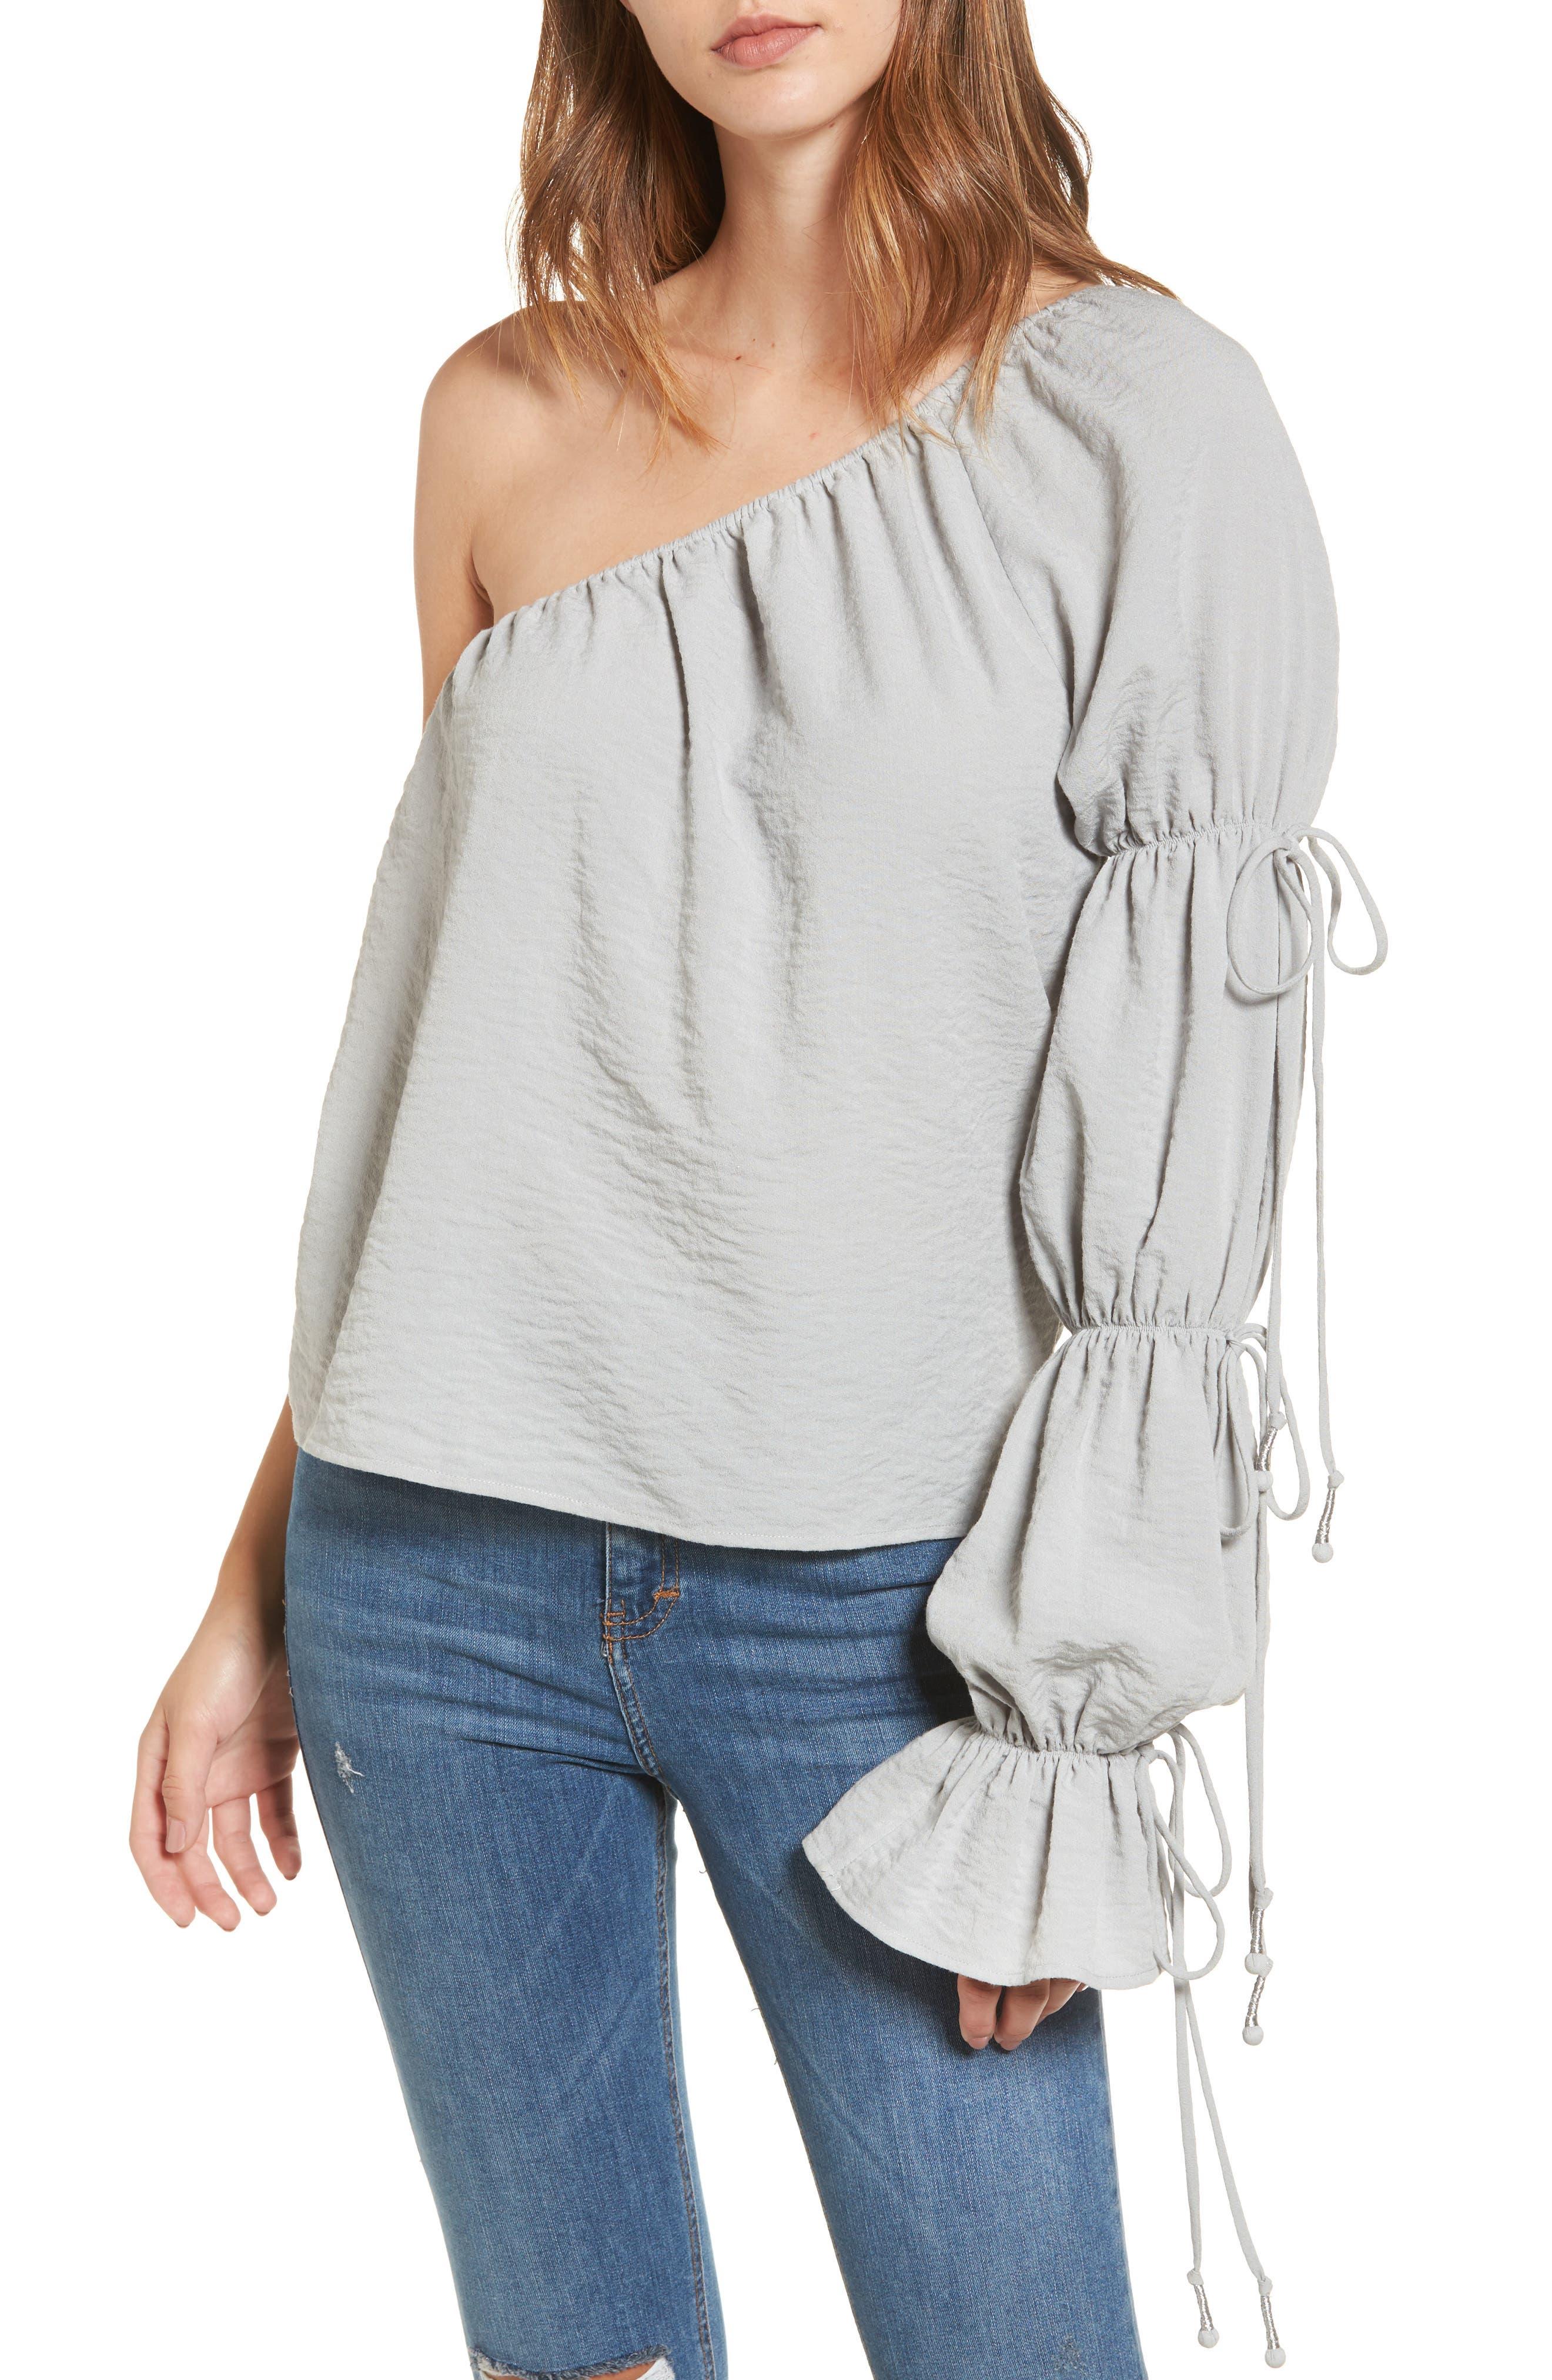 Alternate Image 1 Selected - Tularosa Gigi One-Shoulder Top